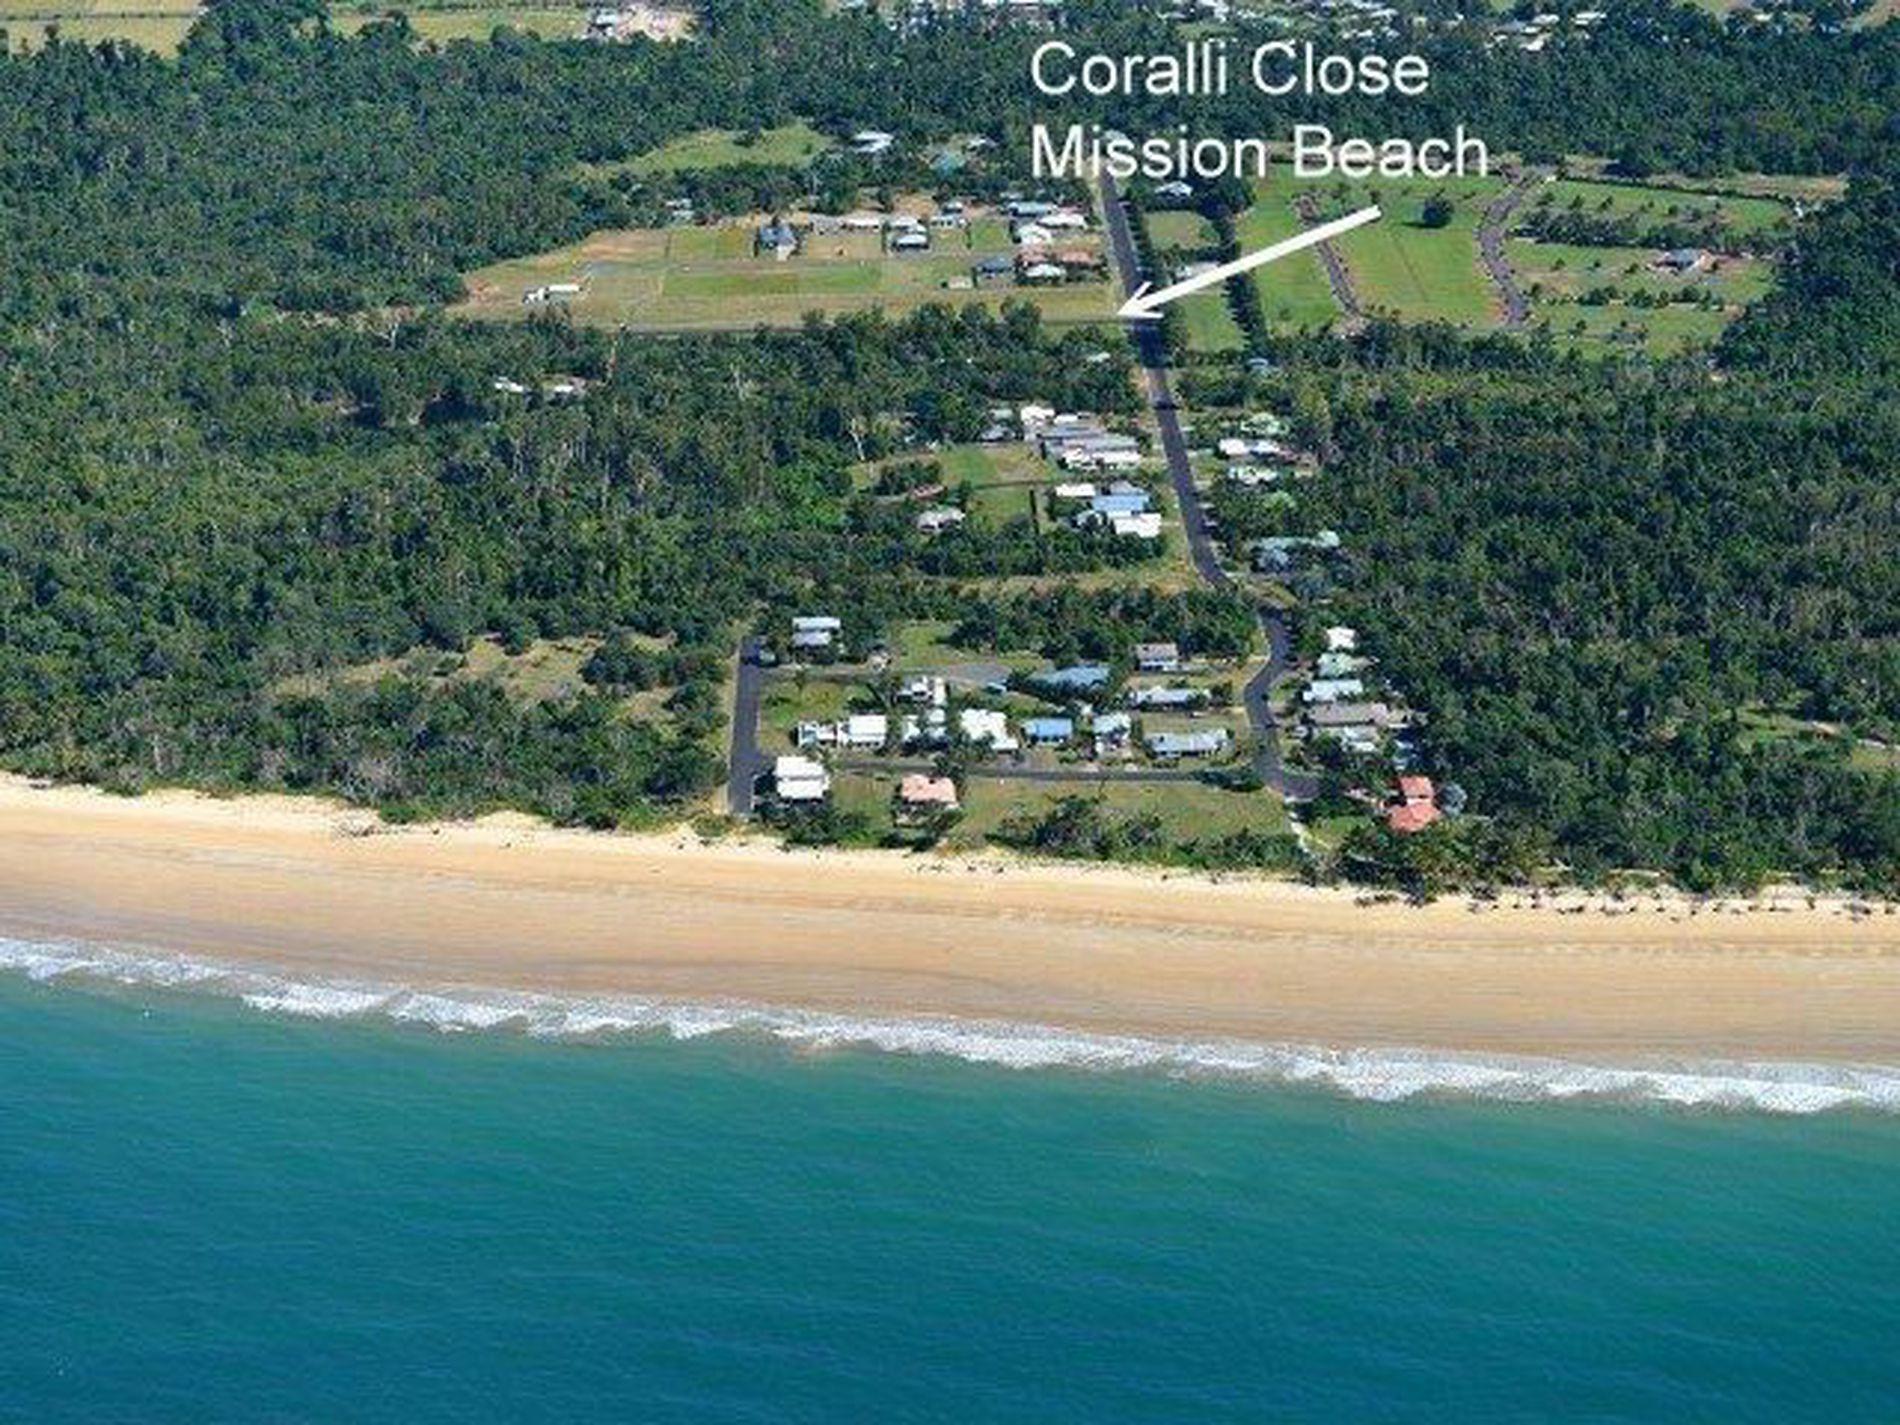 Lot 14, Lot 14 Coralli Close, Mission Beach